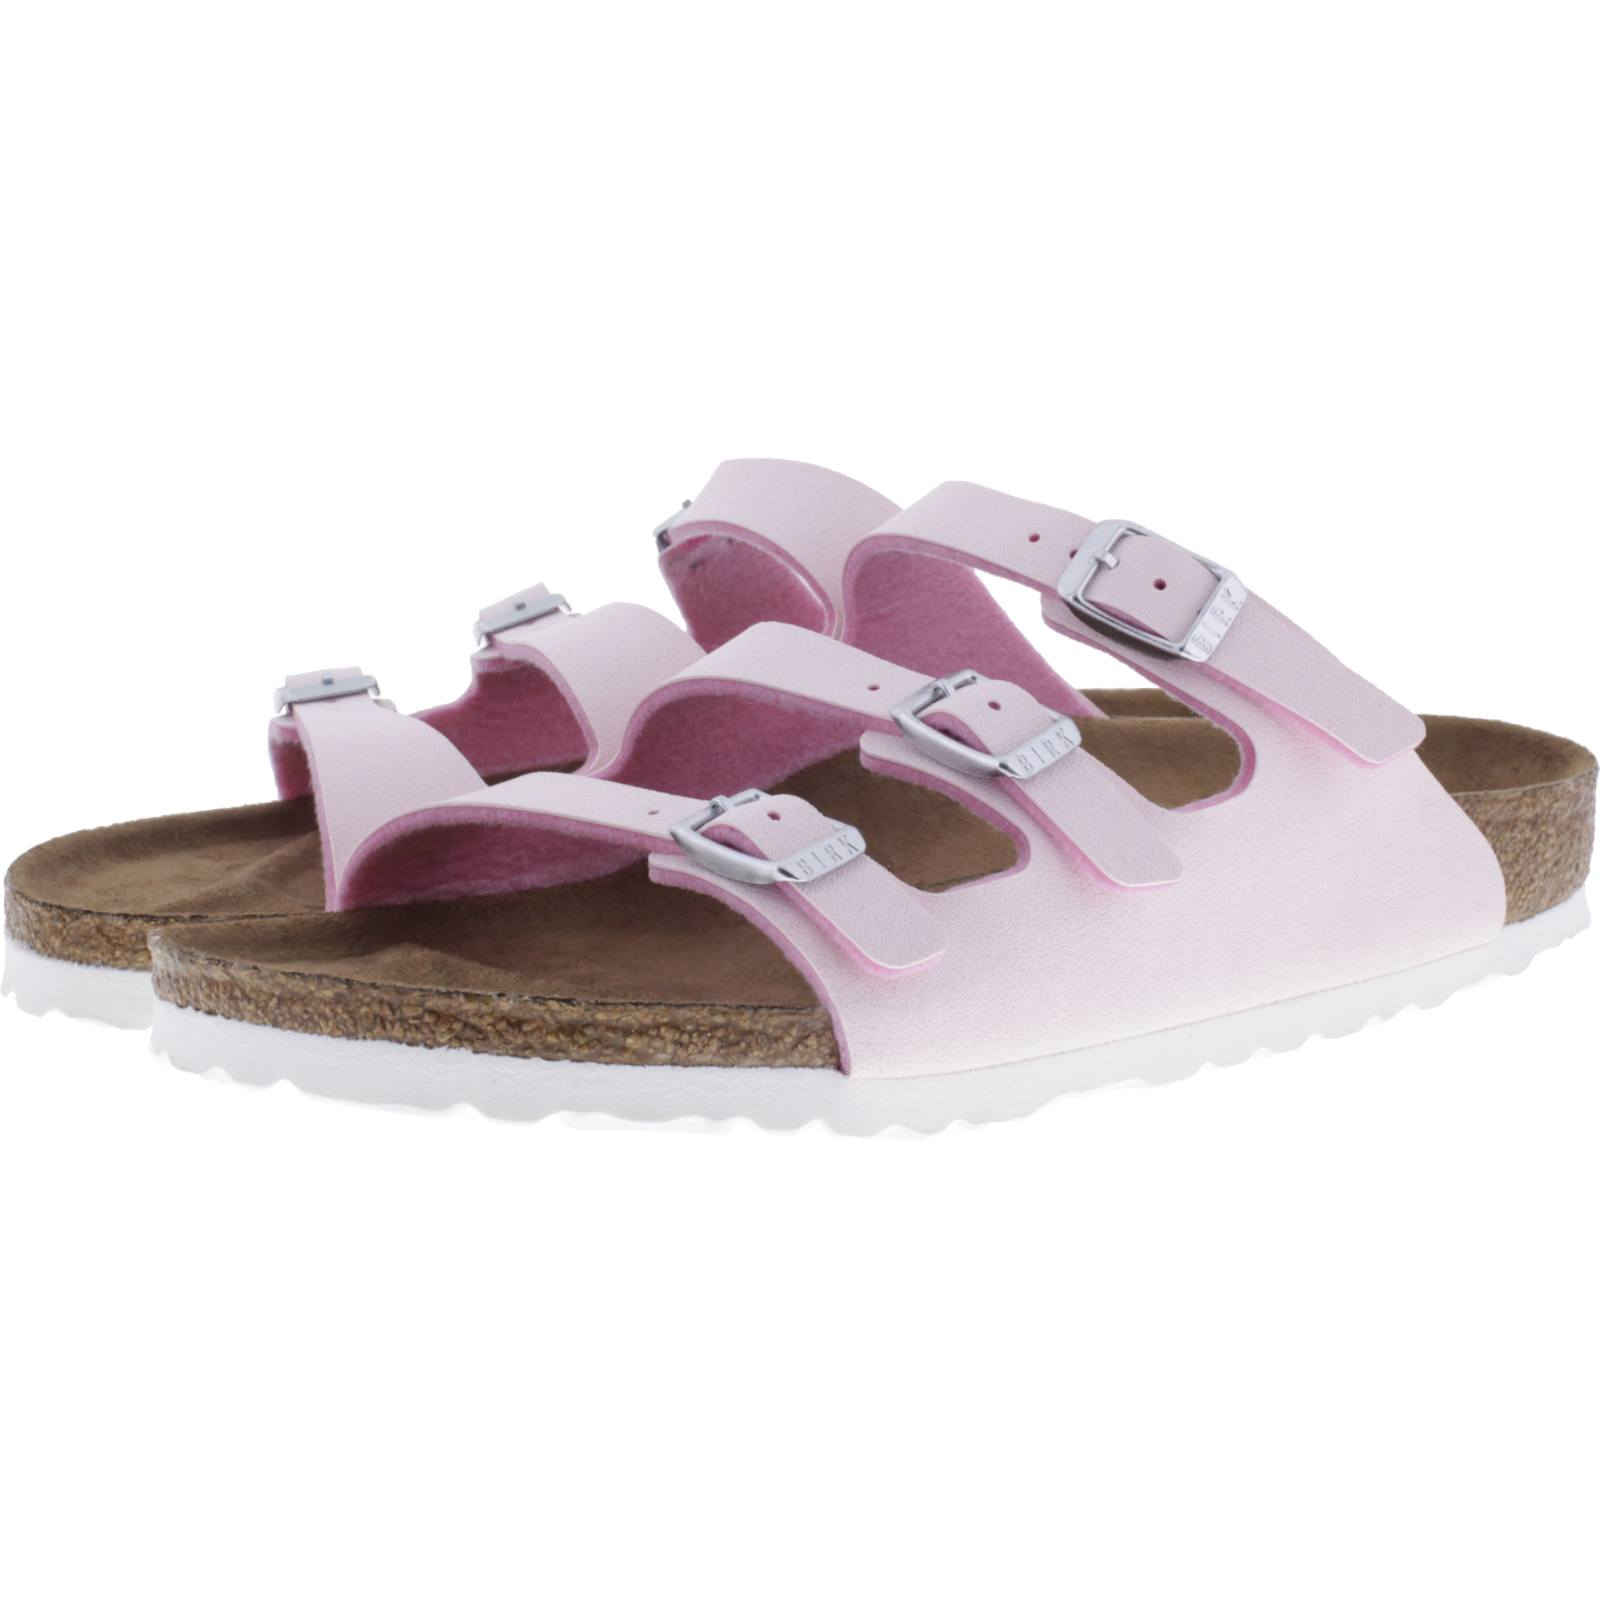 8fe5aa5a385b16 Birkenstock Online Shop - Birkenstock Schuhe günstig kaufen